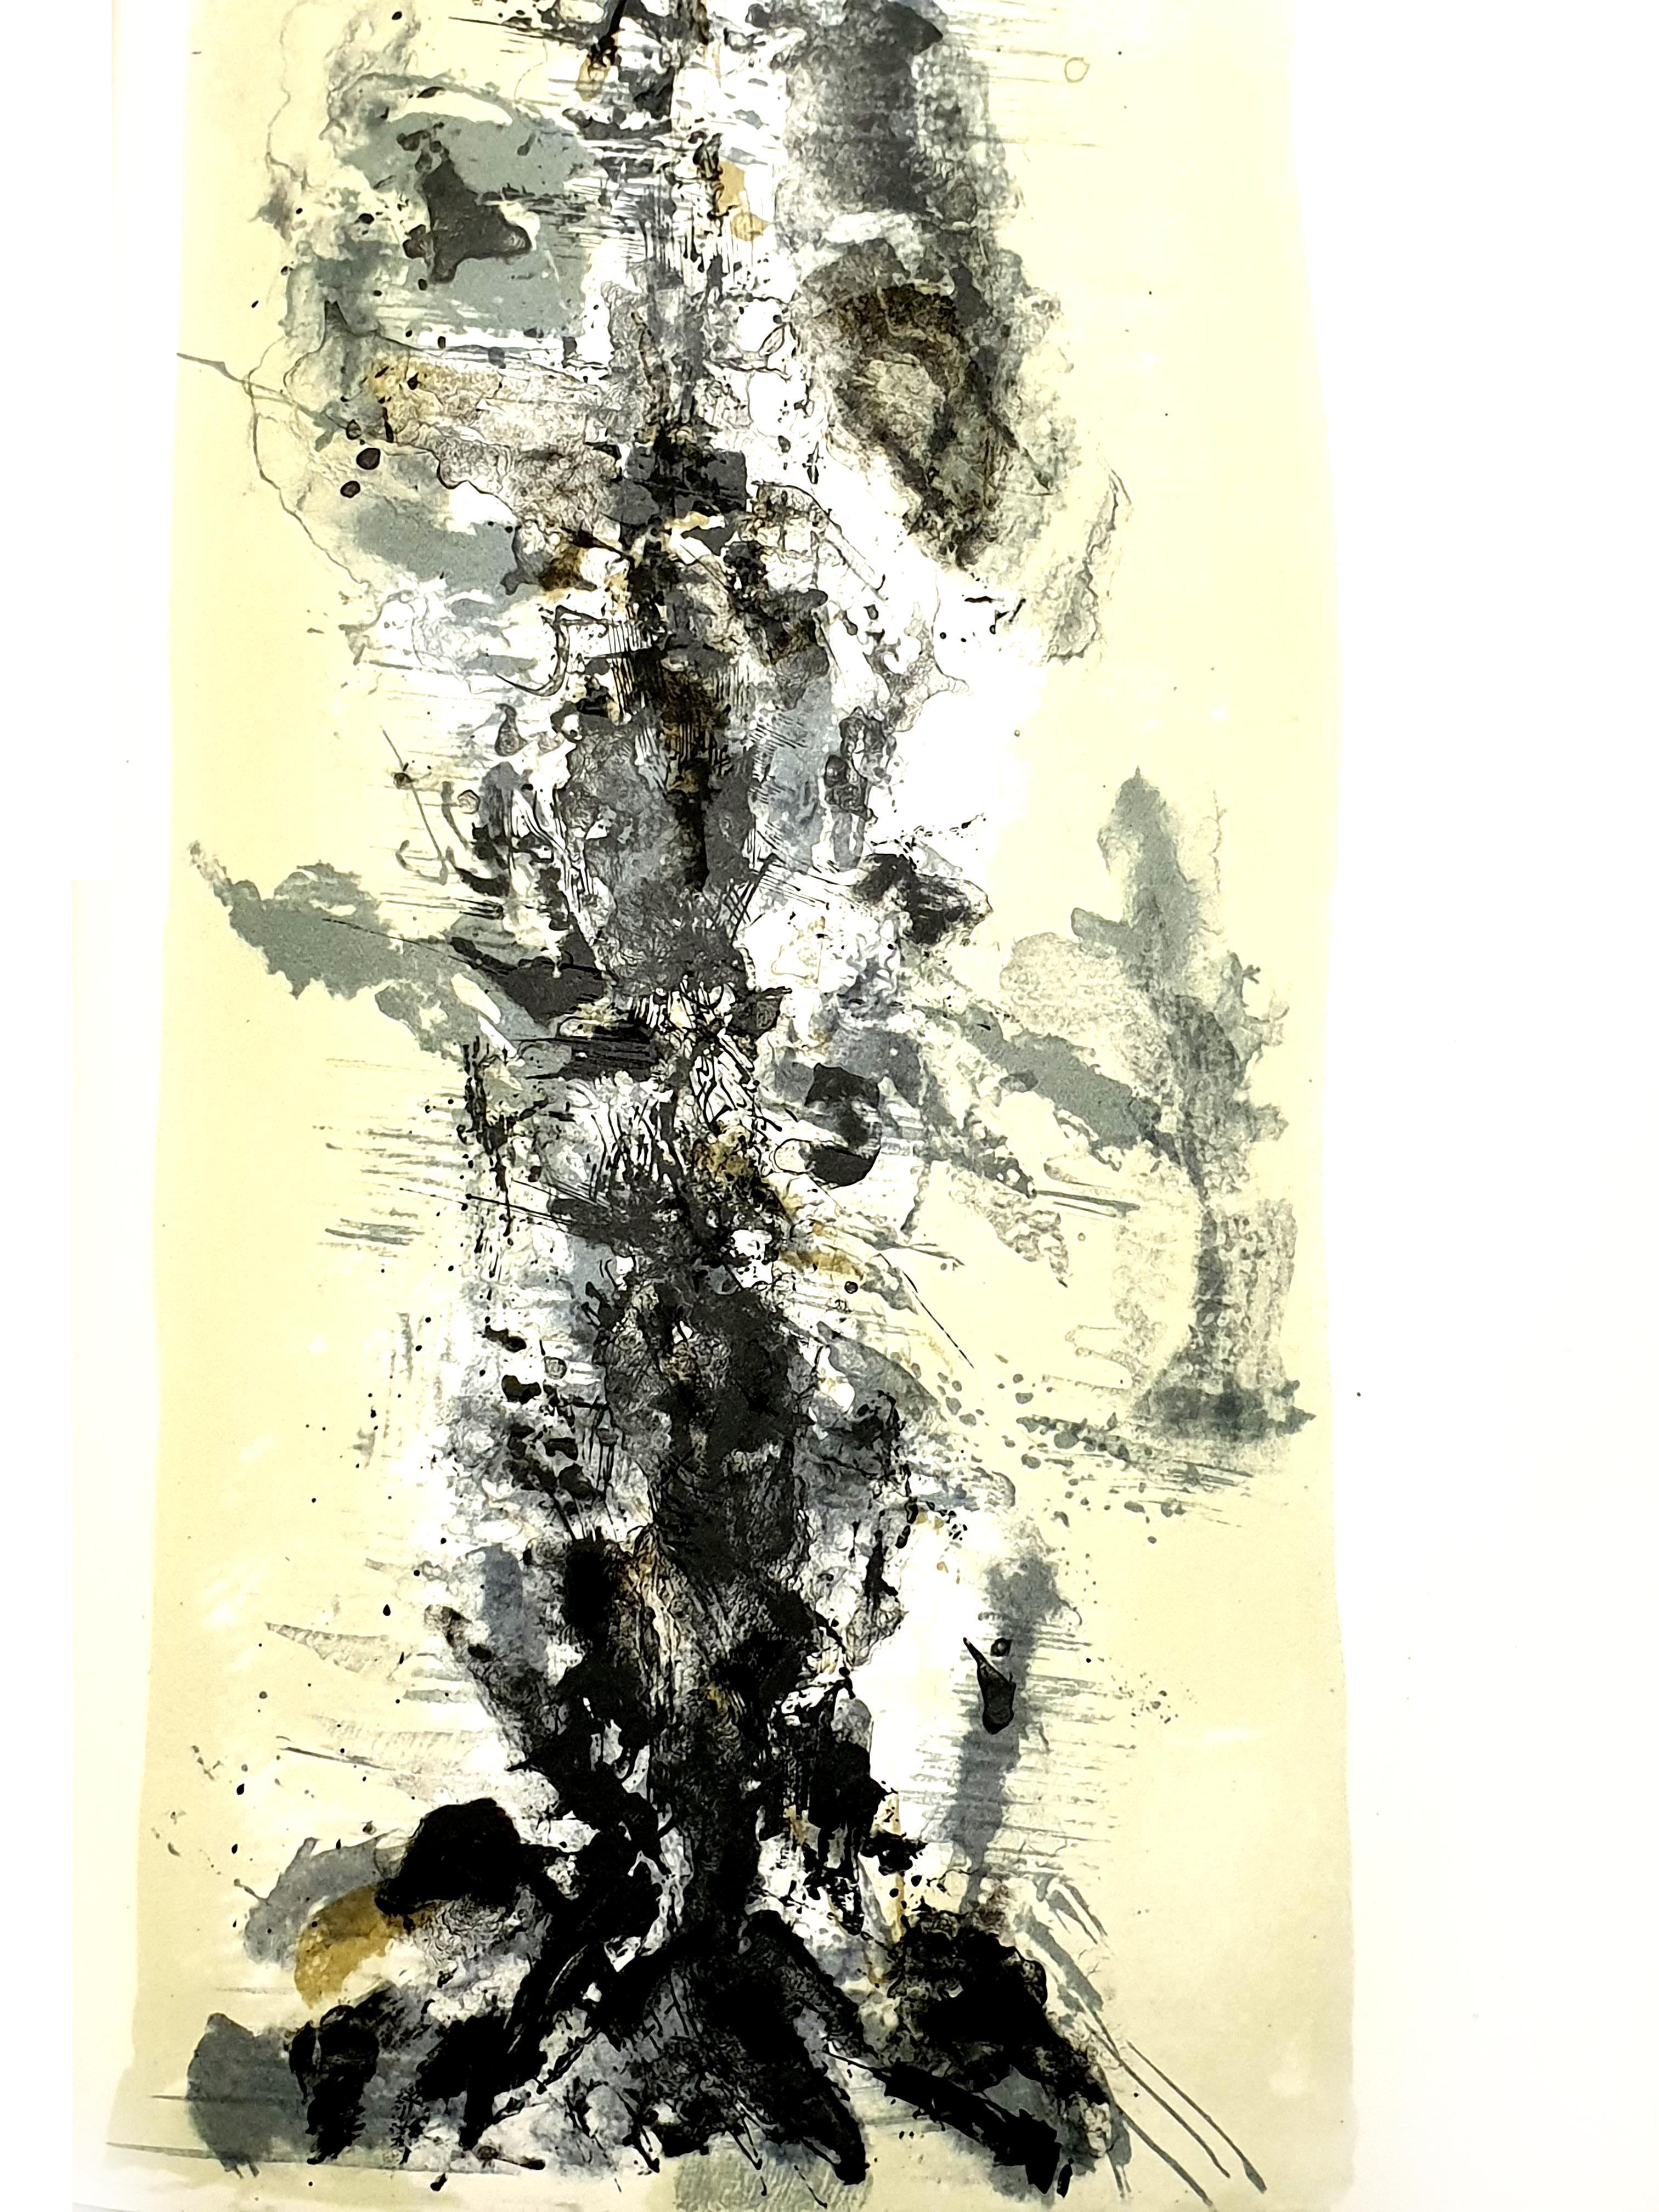 Zao Wou-ki - Original Lithograph - Abstract Composition